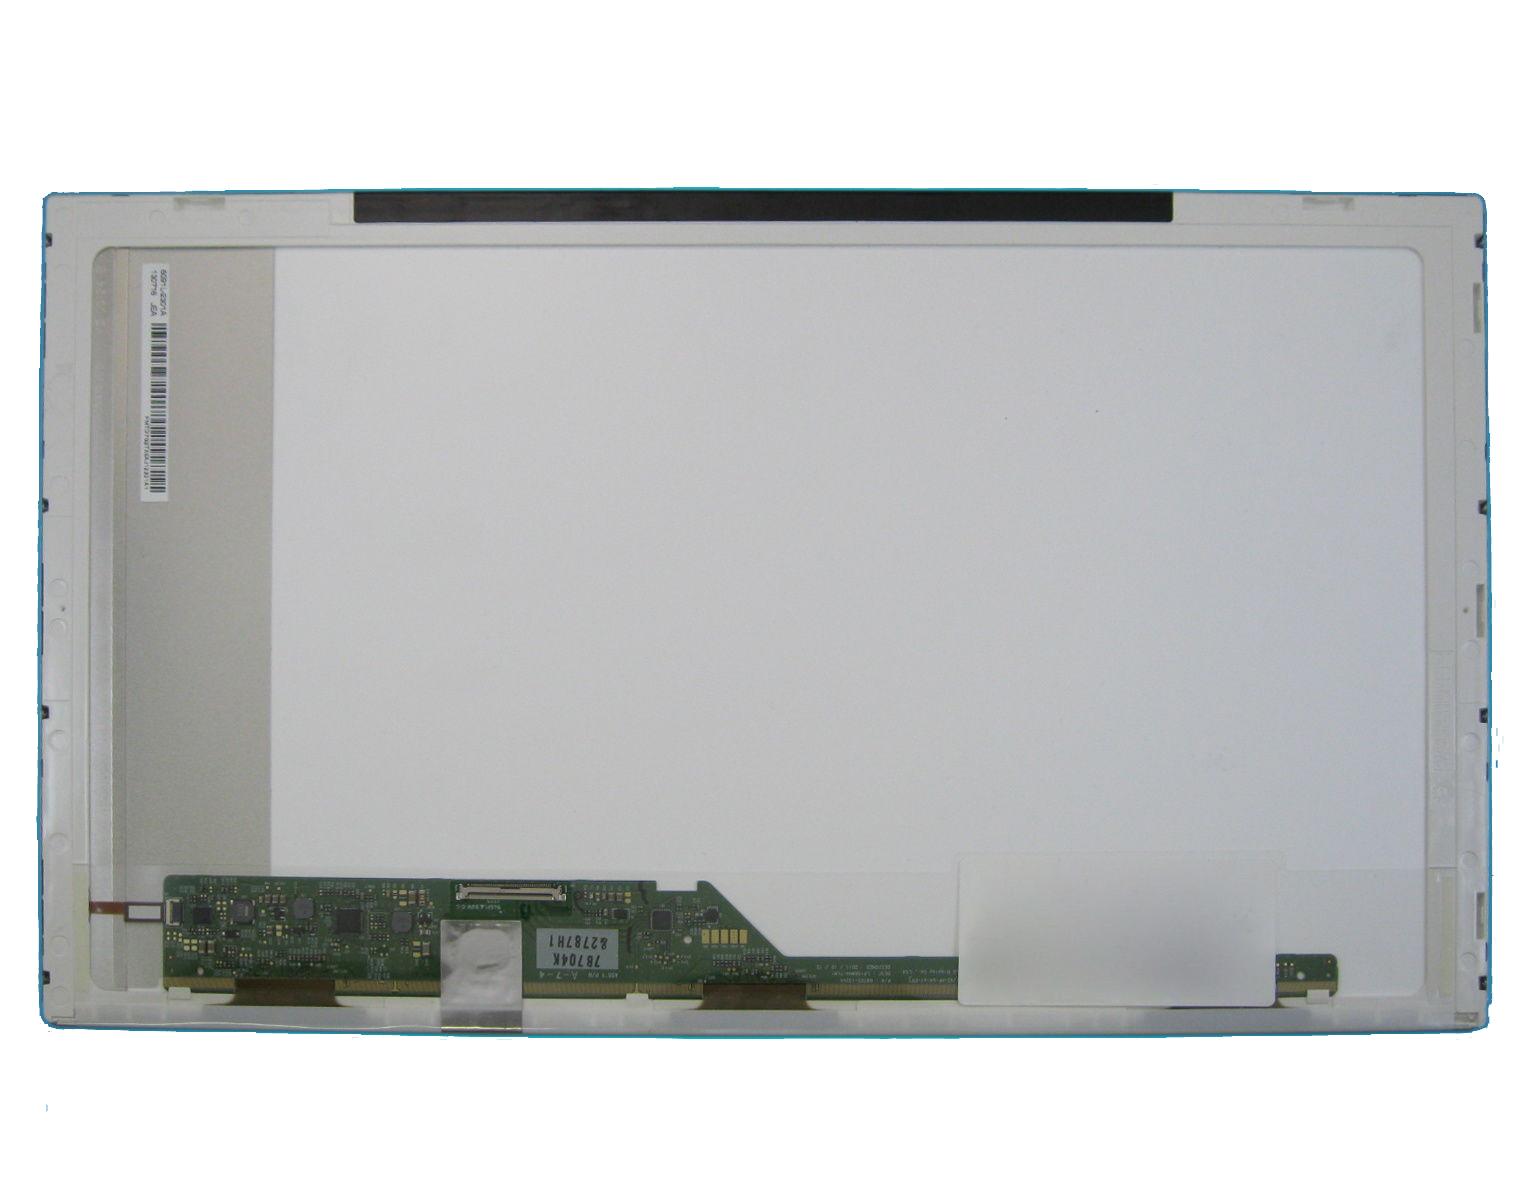 Здесь можно купить  QUY Laptop LCD Screen 15.6 inch for HP-Compaq HP G62-A12SD perfect screen without dead piexls  Компьютер & сеть